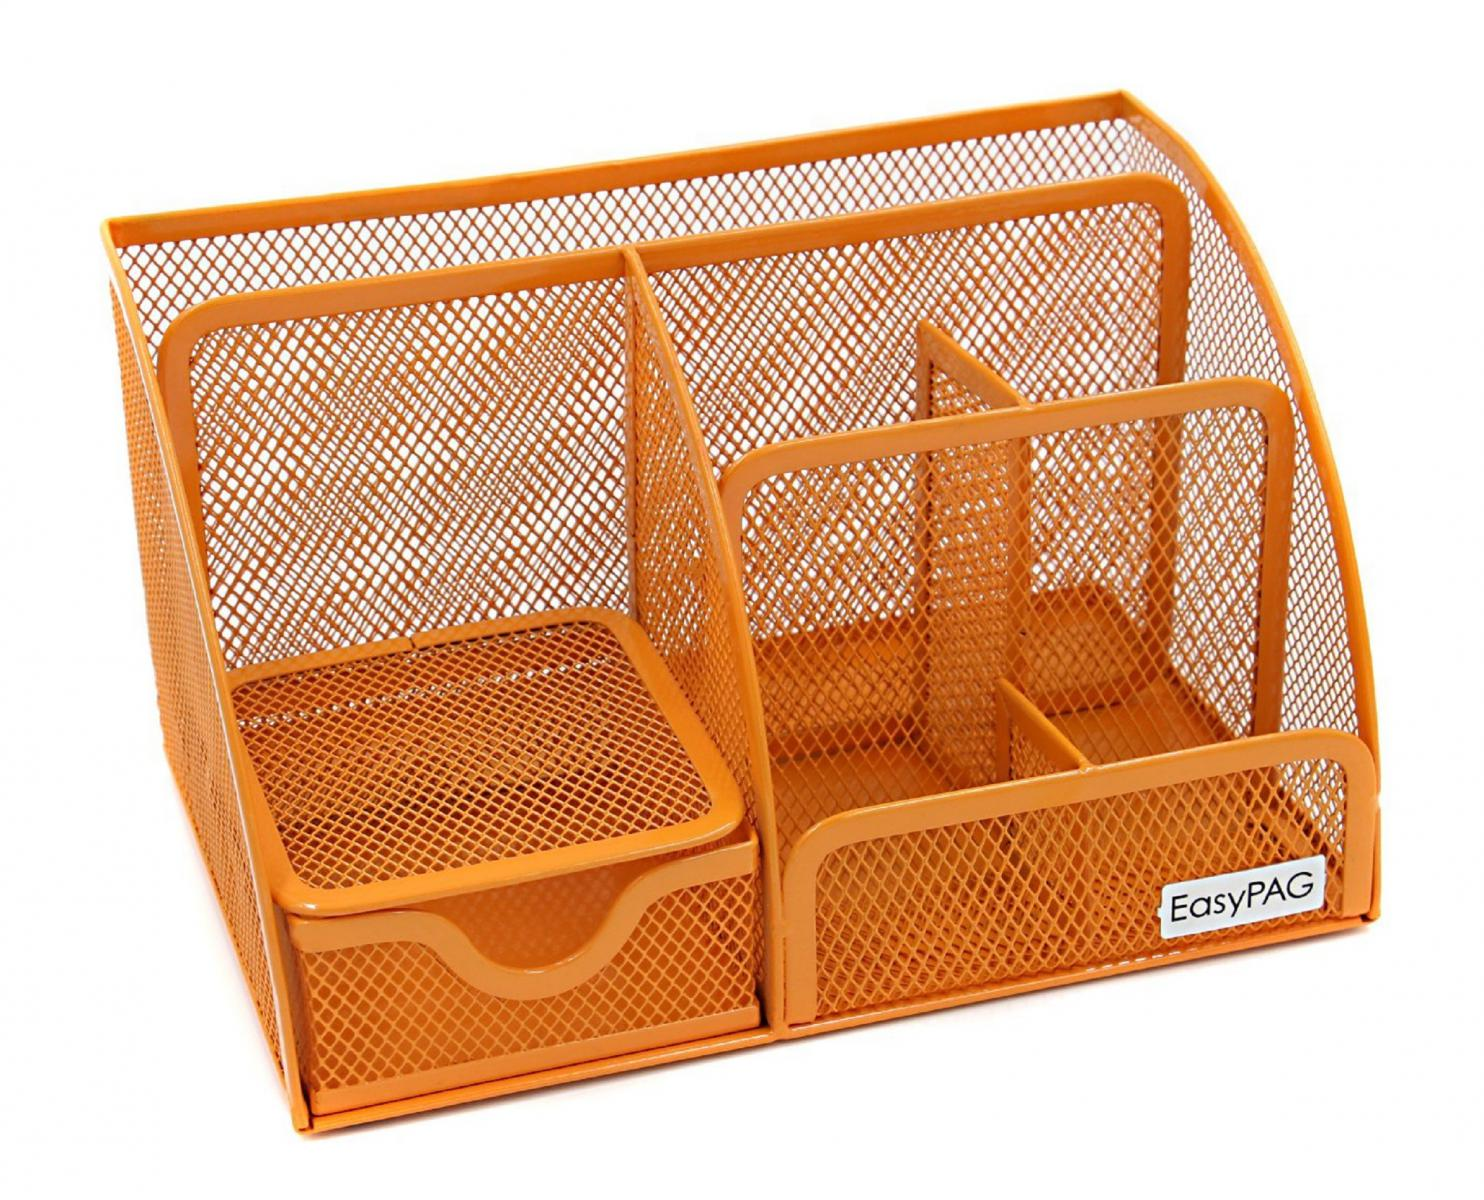 new easypag mesh metal desk organizer 6 compartment office. Black Bedroom Furniture Sets. Home Design Ideas